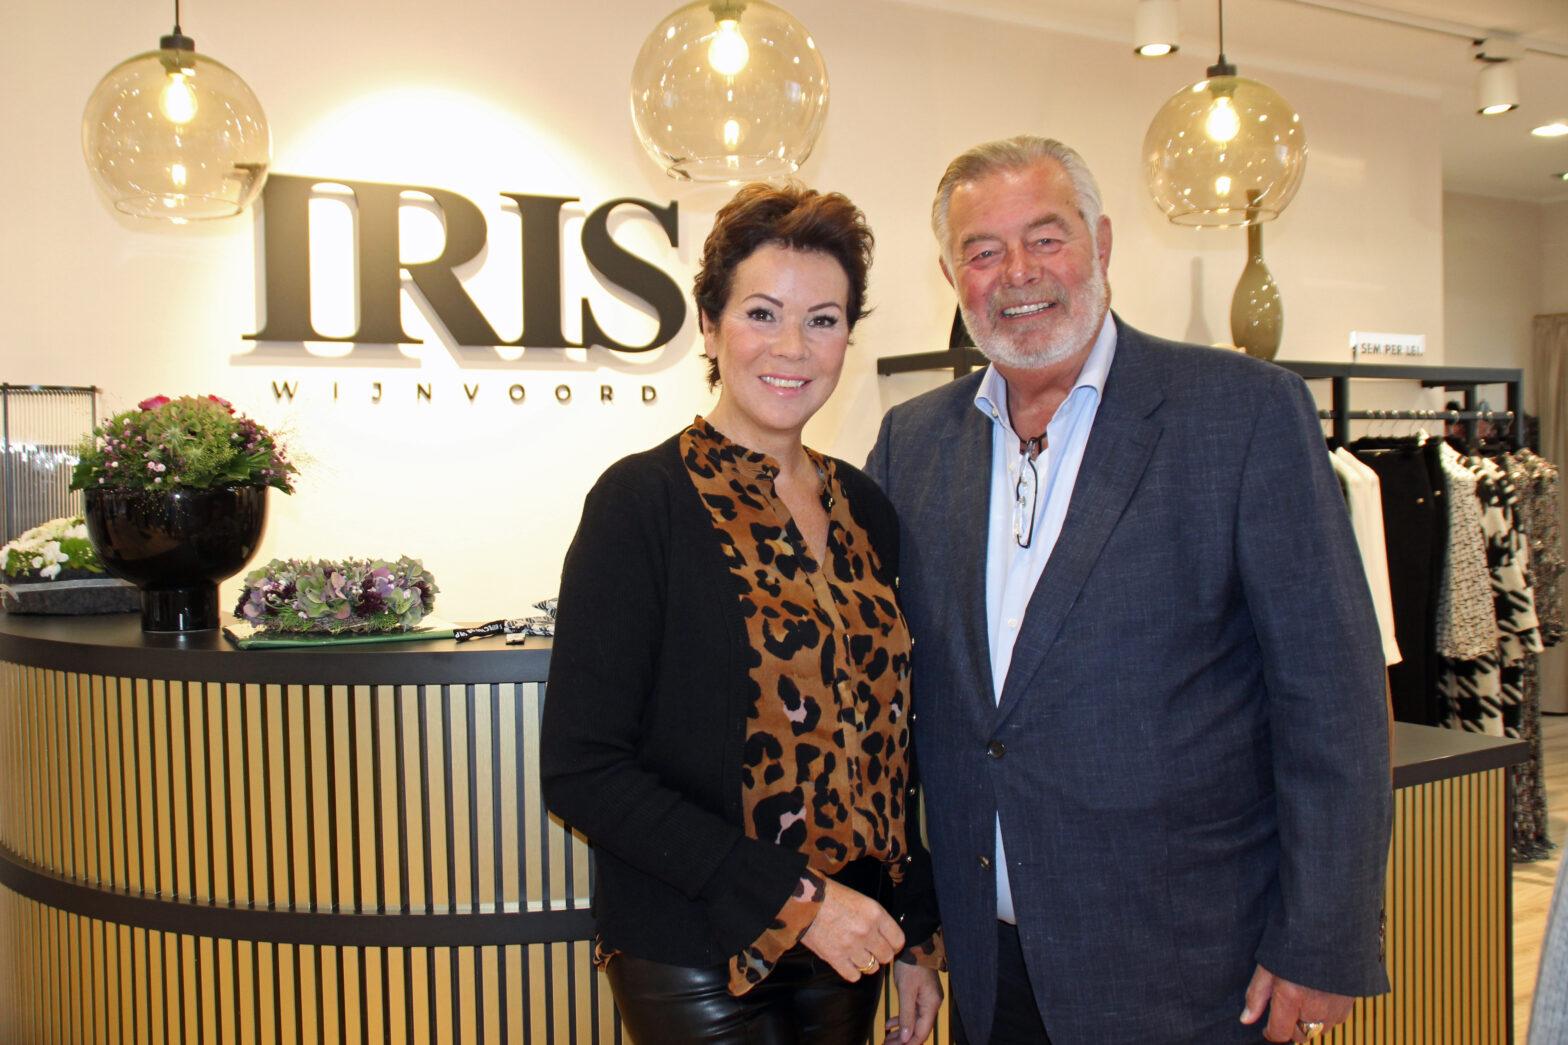 Iris-Wijnvoord